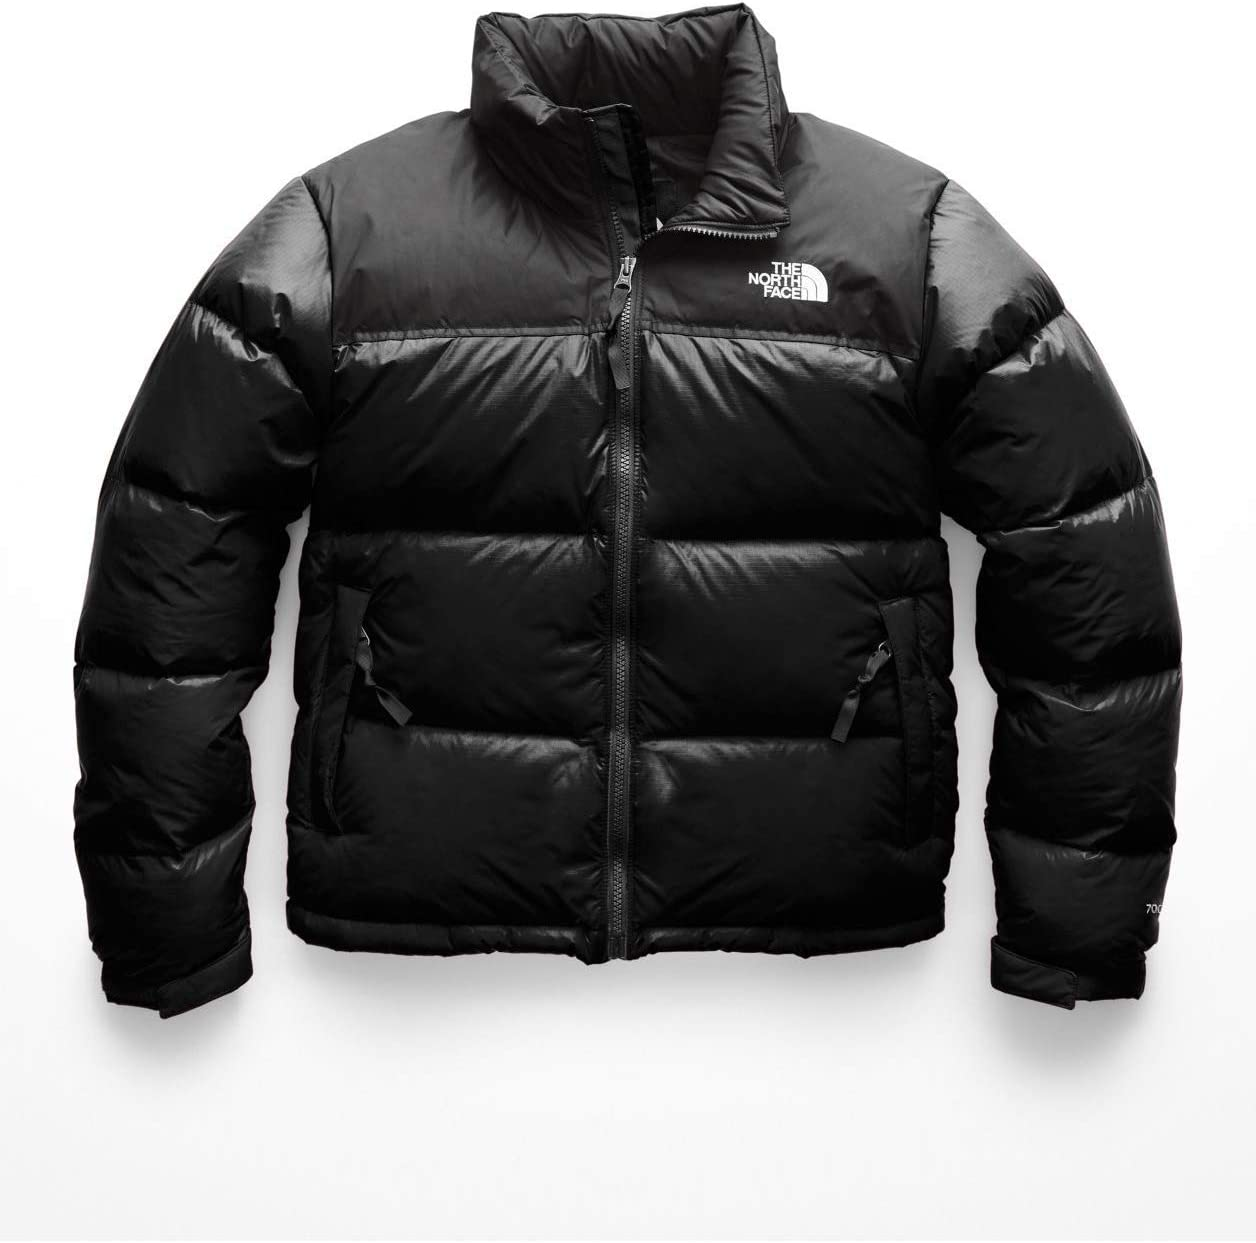 The North Face 1996 Retro Nuptse W down jacket black